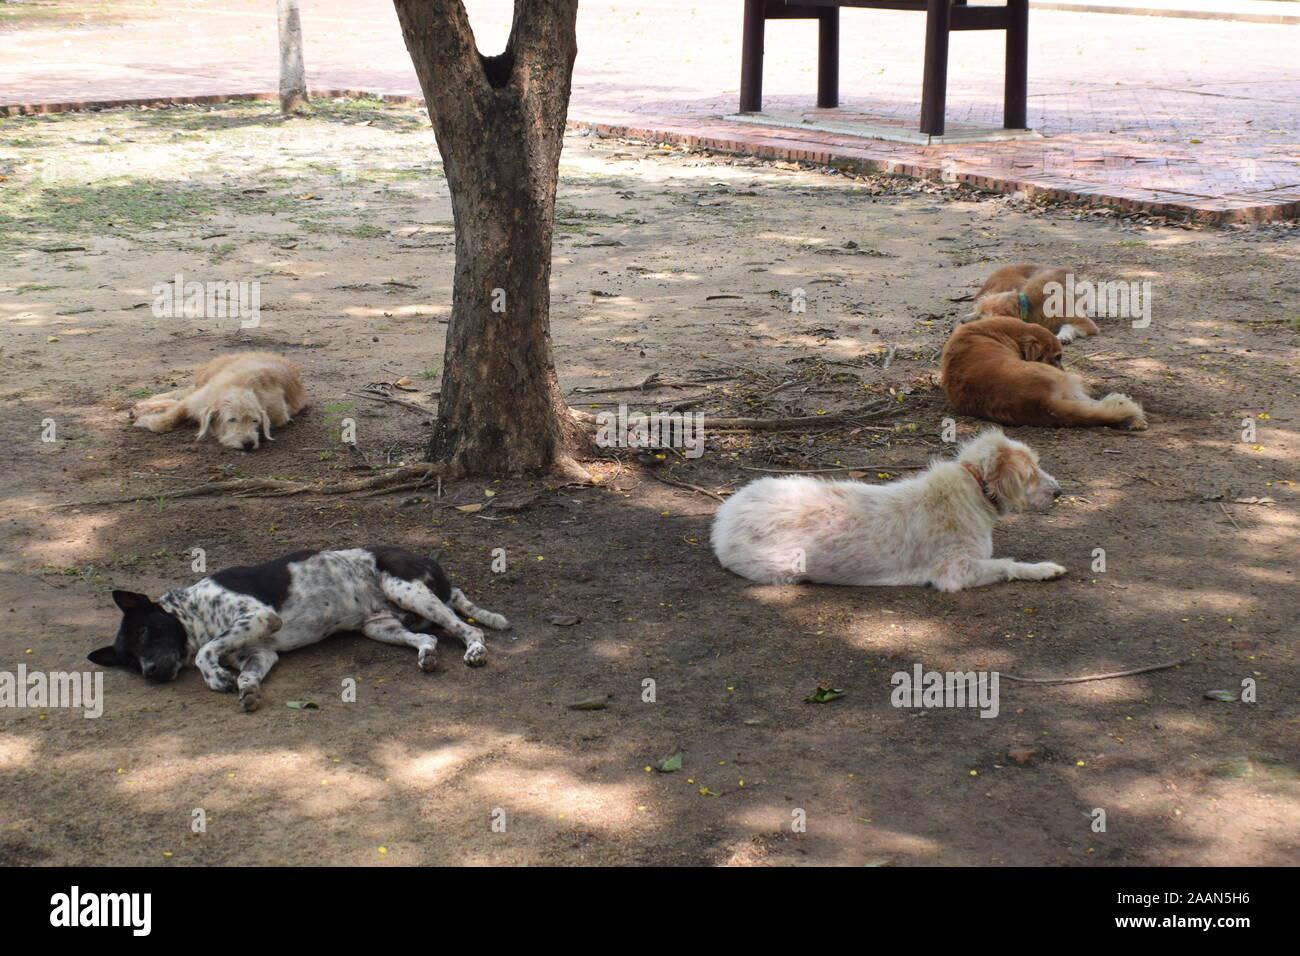 sleeping dogs thailand Stock Photo